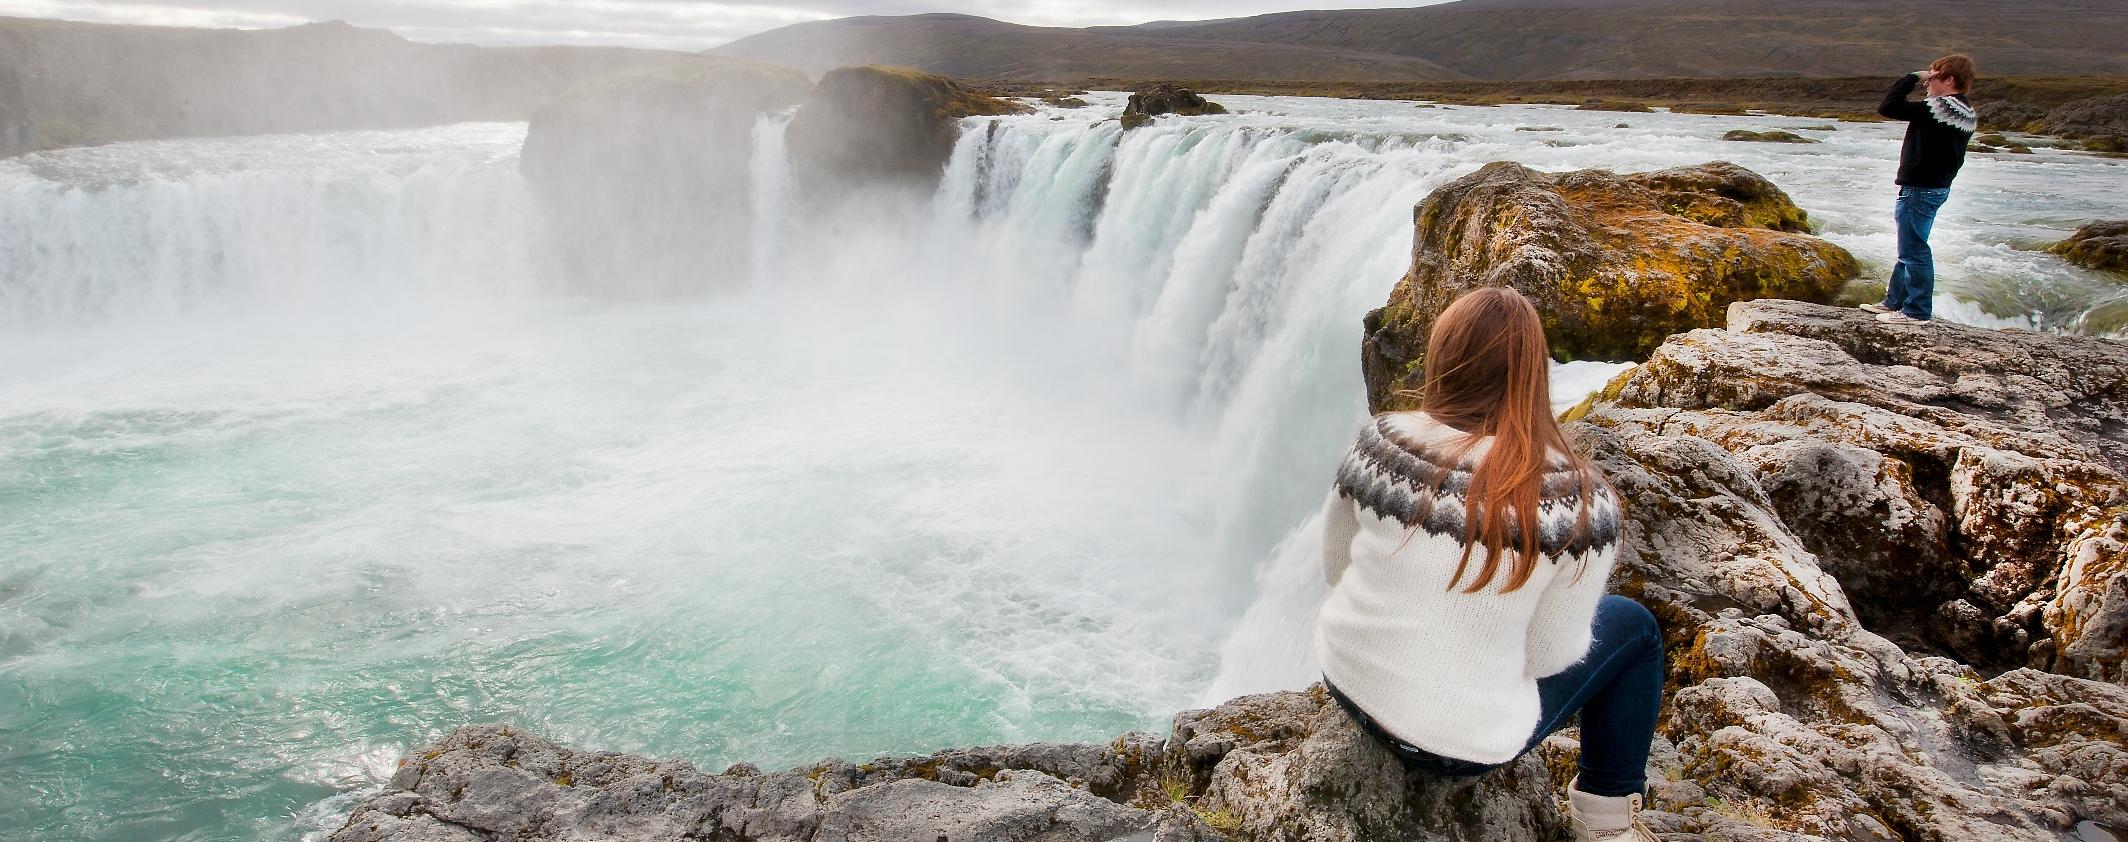 Frau mit Islandpulli beobachtet den Wasserfall Godafoss